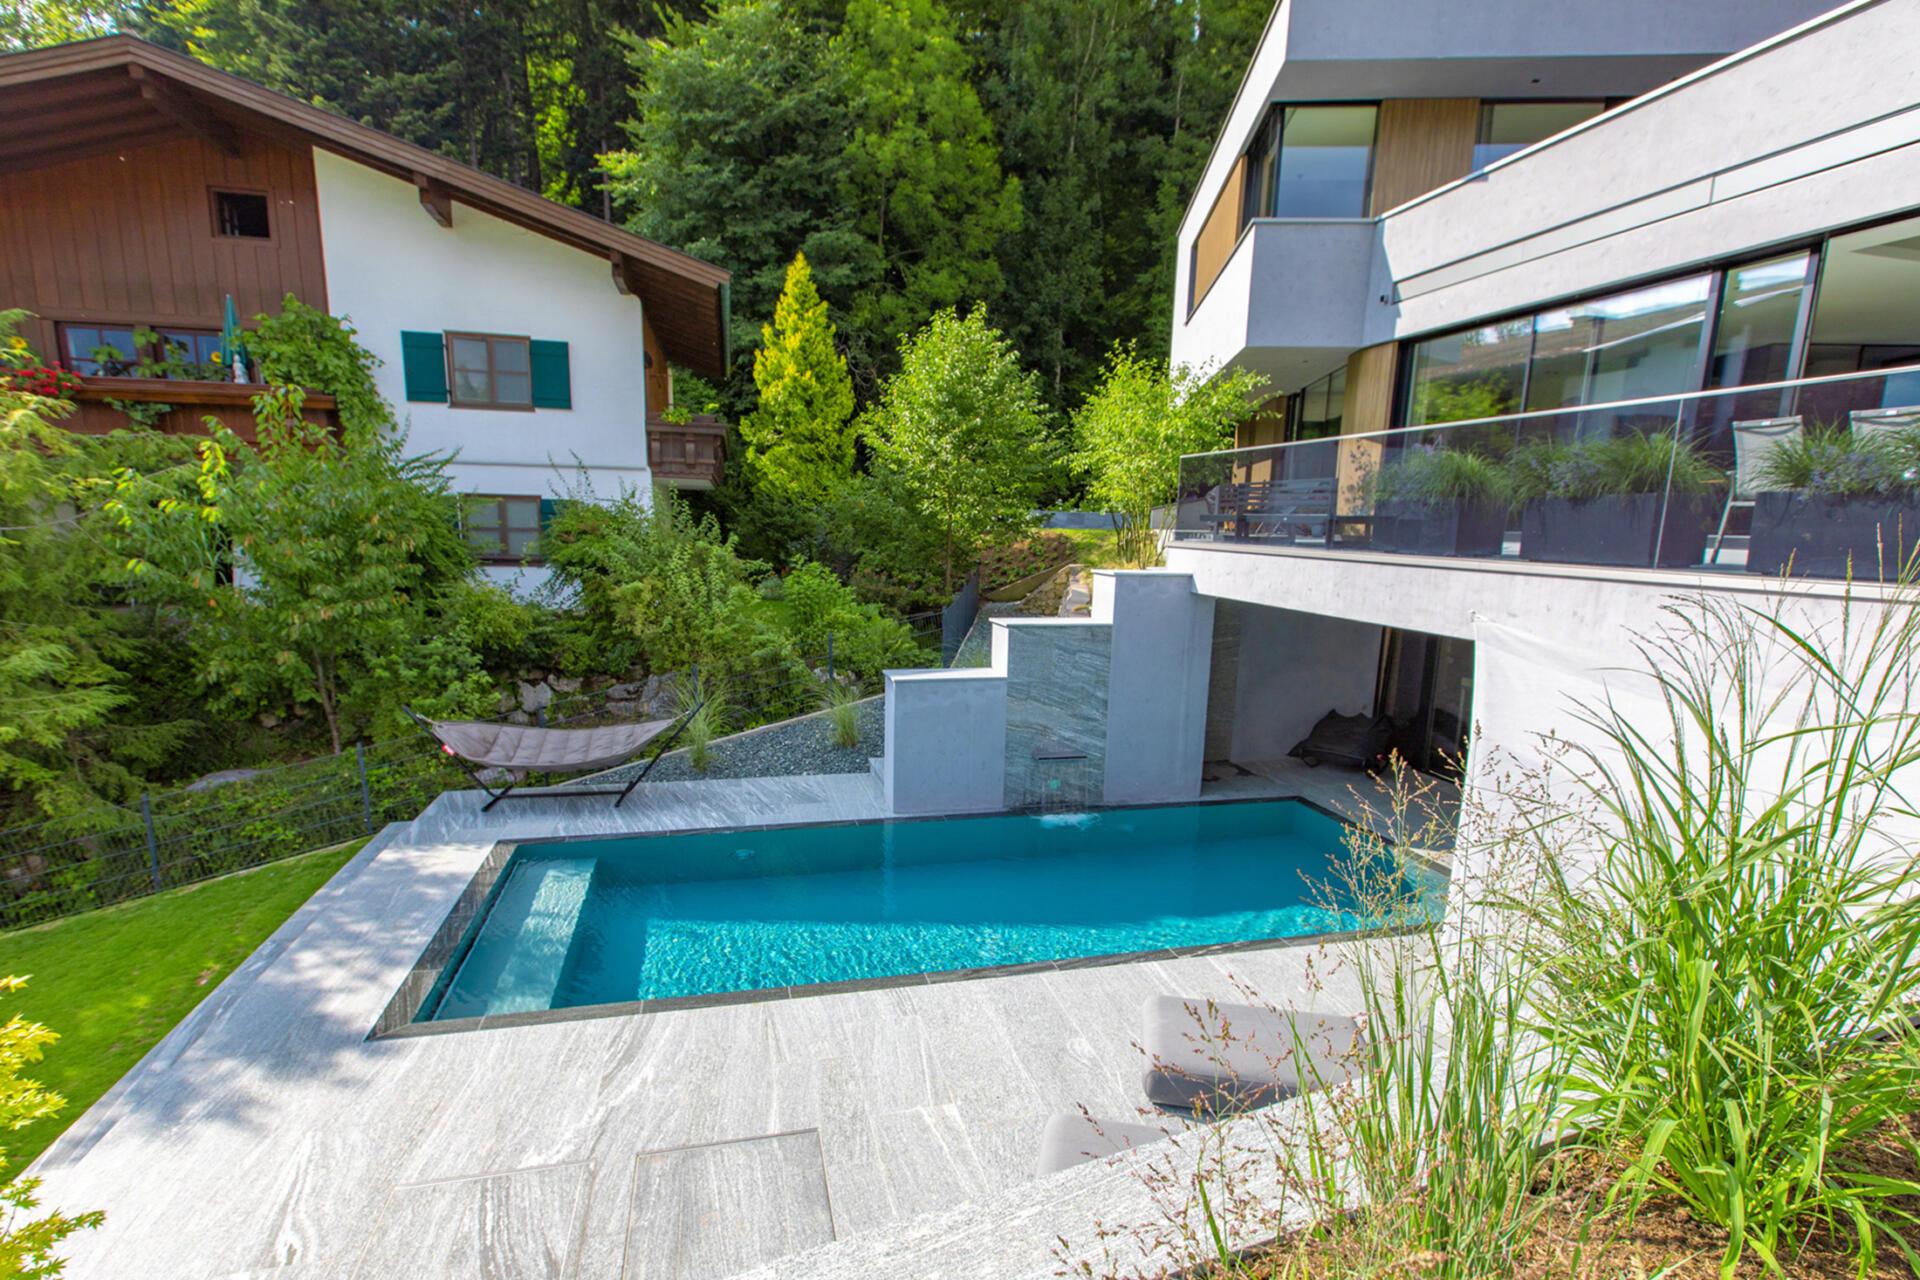 privat-f-niveko-sst-pool-referenz-06-saurwein-schwimmbad-technik